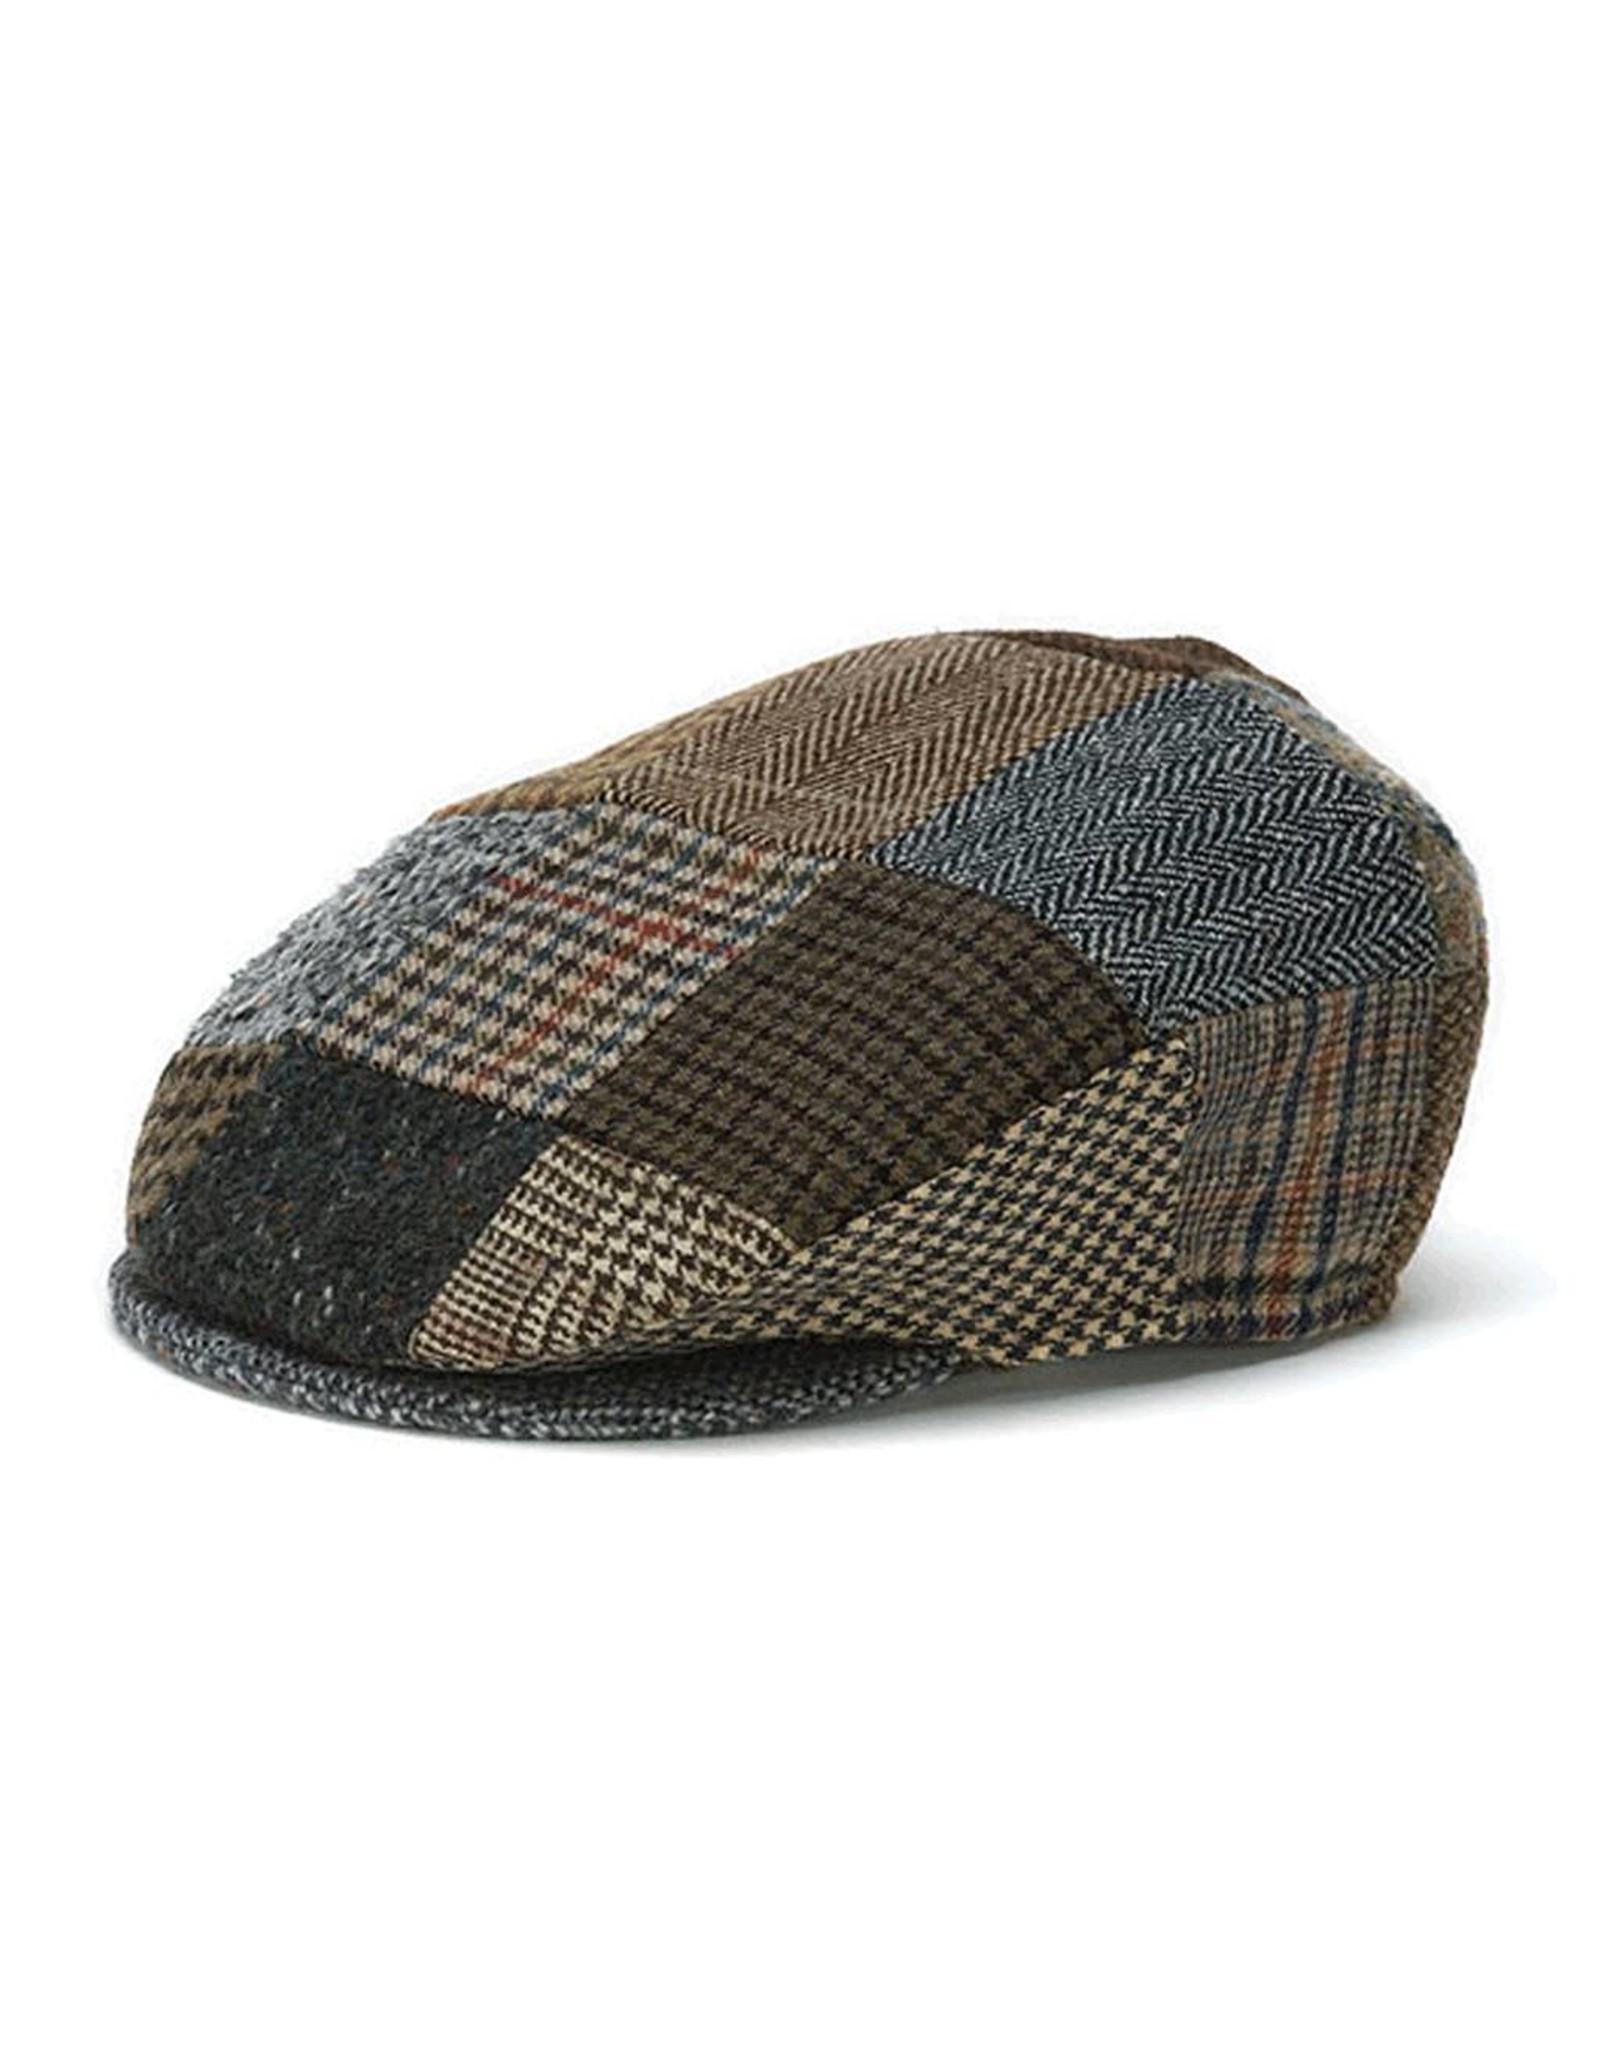 Hanna Hats Child's Tweed Cap by Hanna Hats